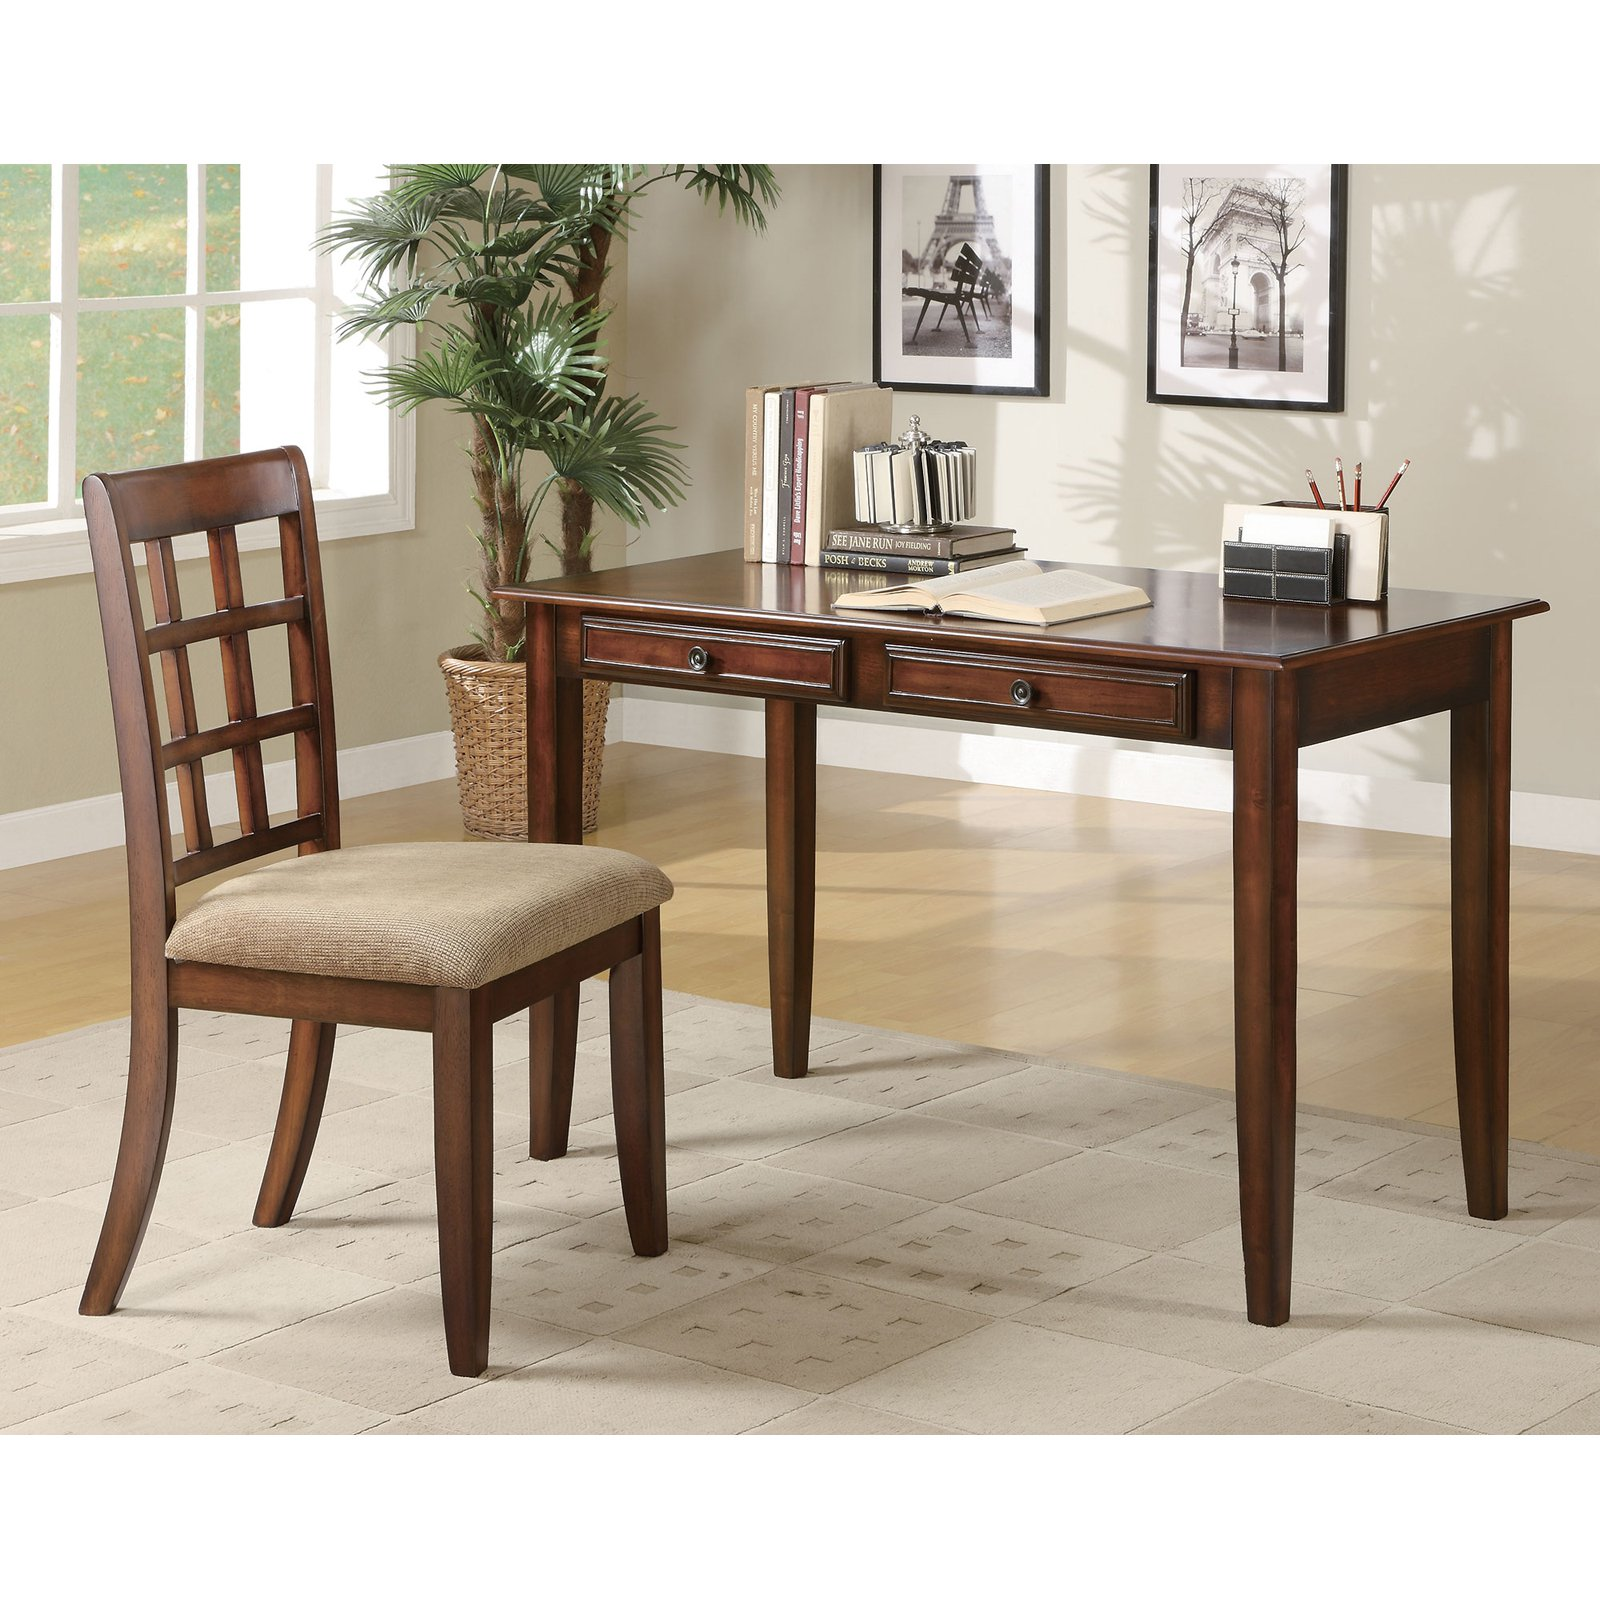 Coaster Versatile Chestnut Office Desk